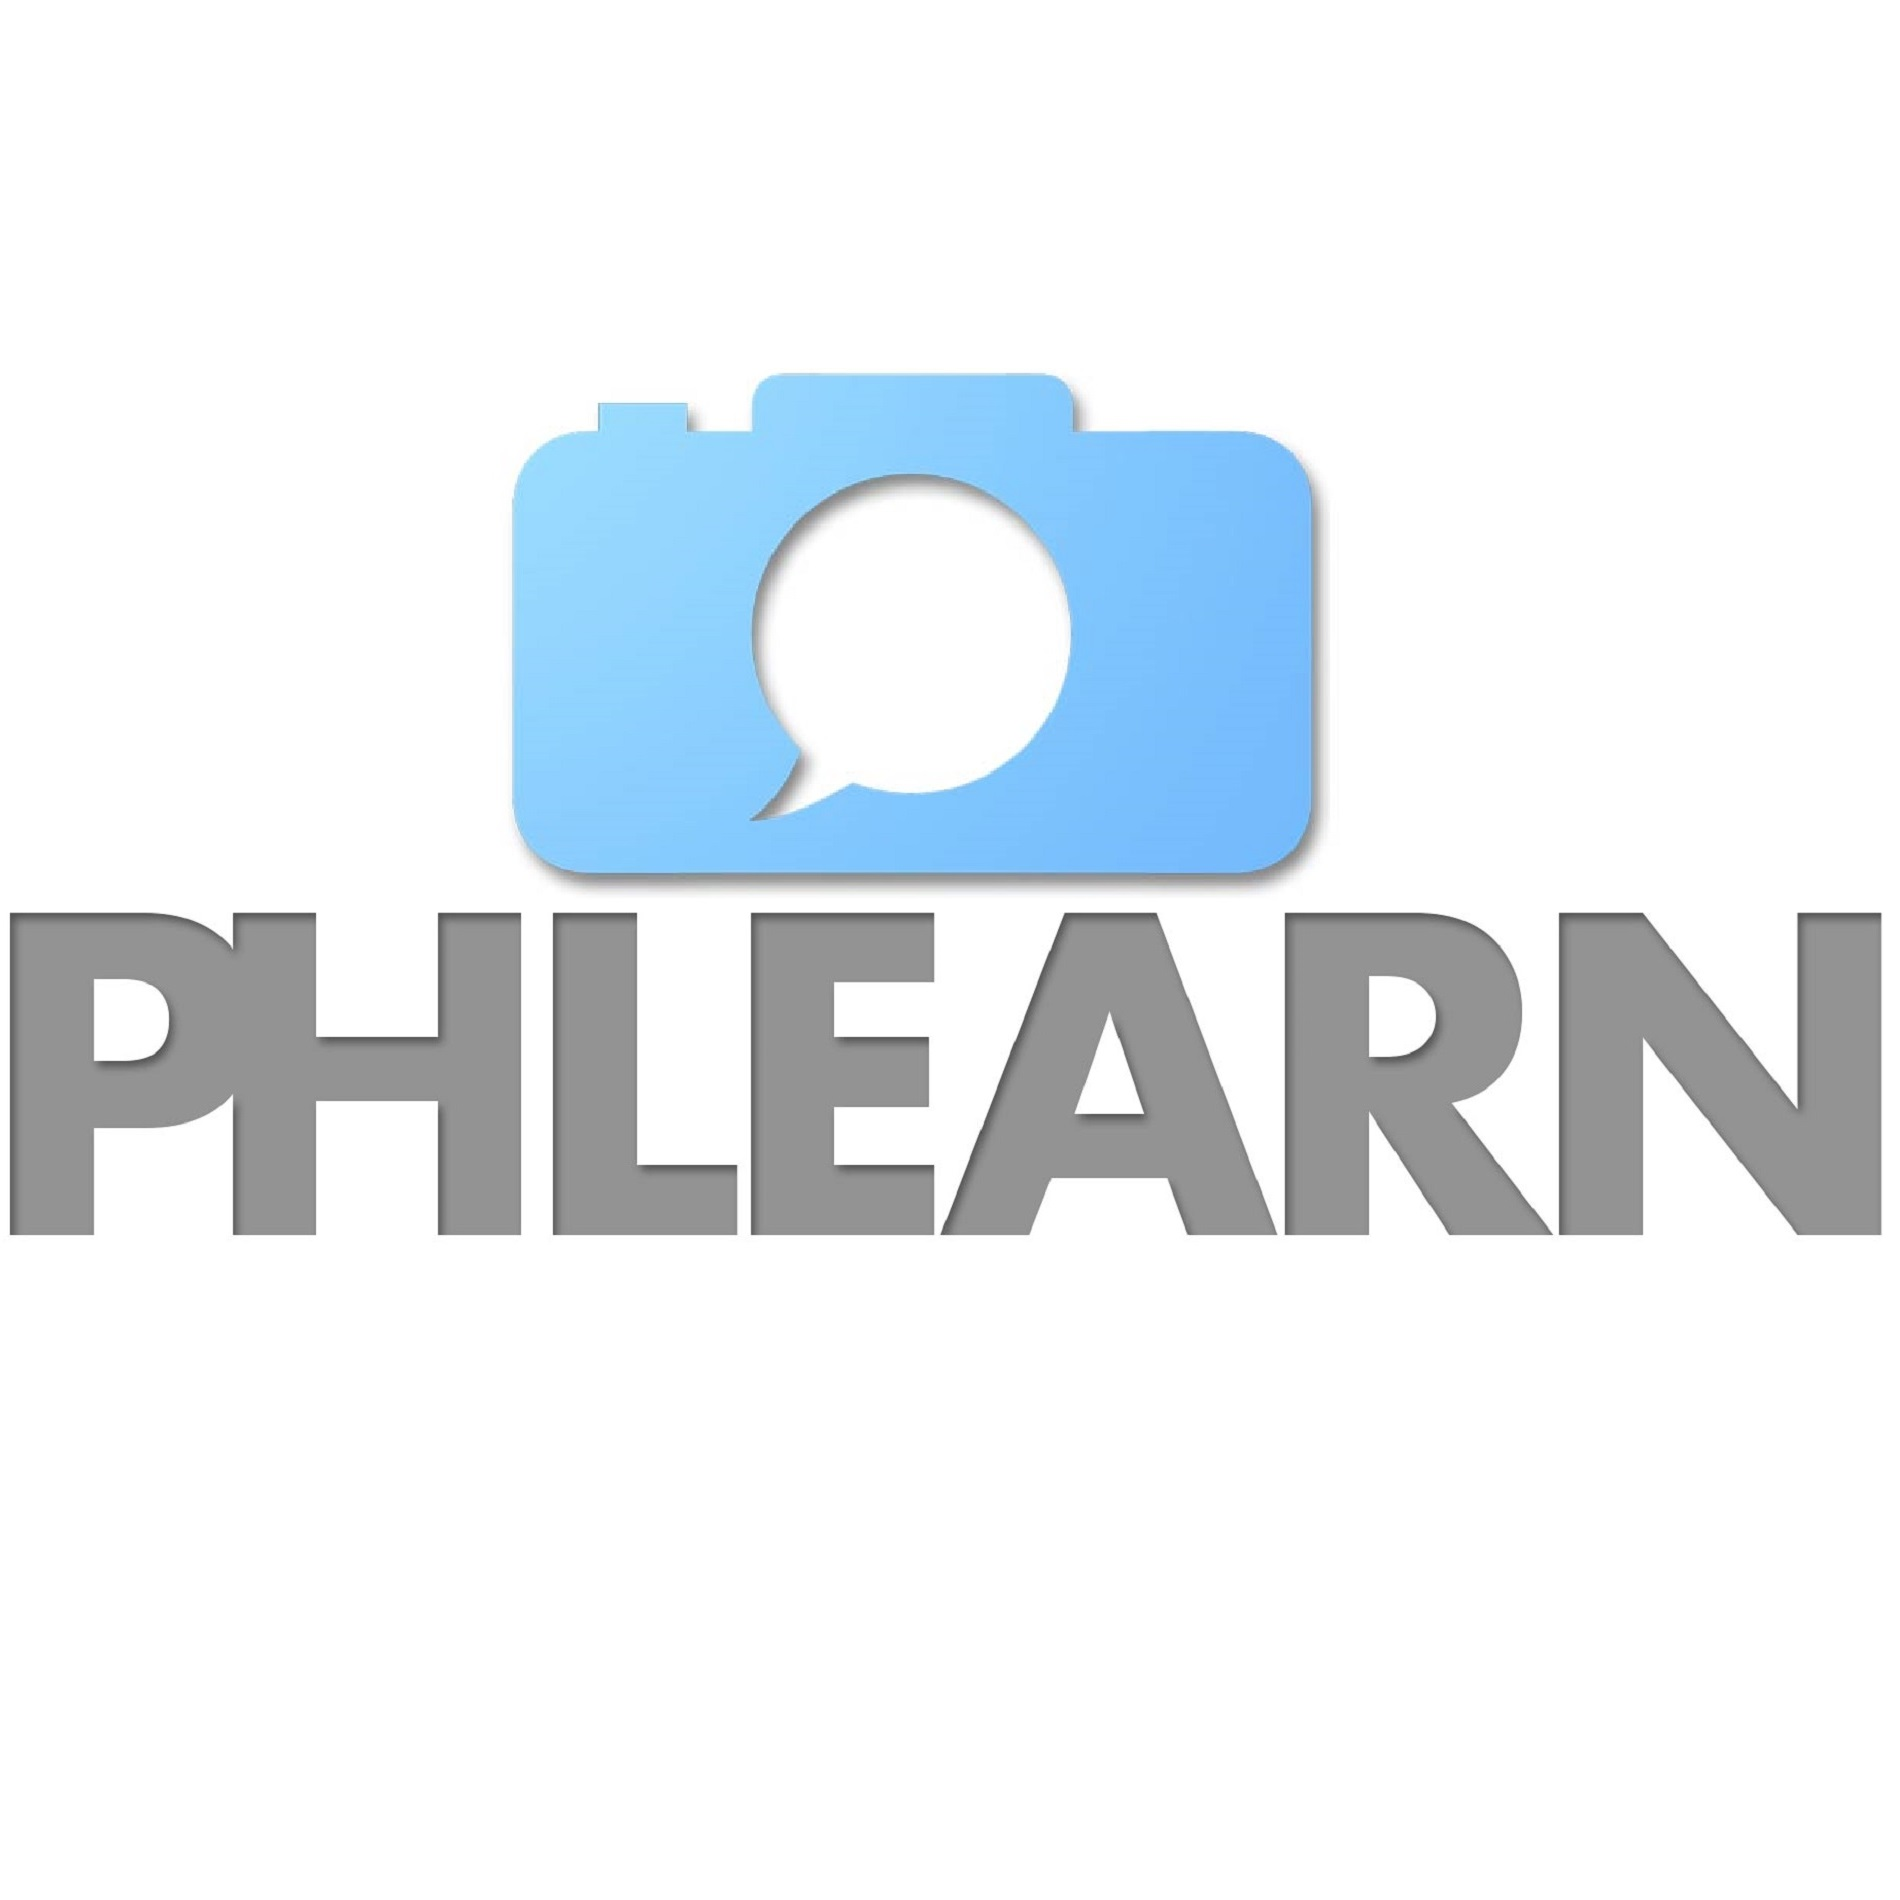 phlearn-logo011900x1900.jpg